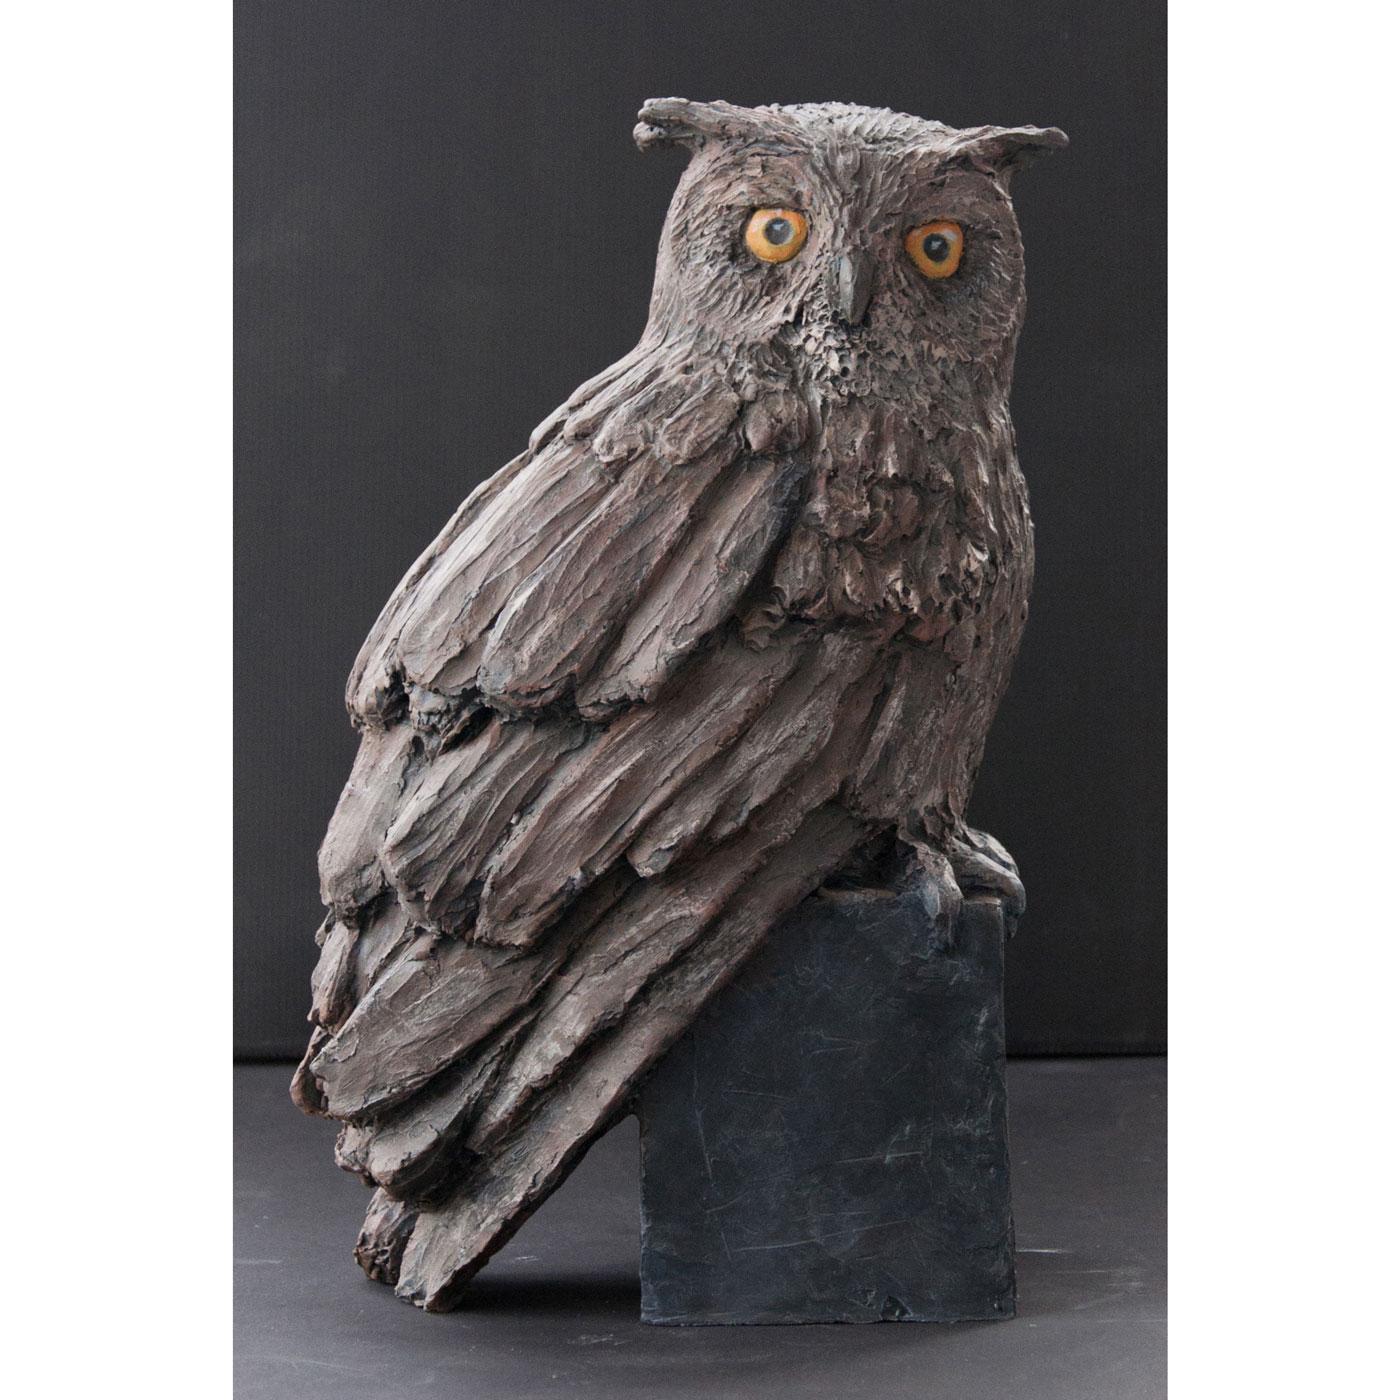 EAGLE OWL,  © 2014, acrylic cast, molded in wax, 25 x 40 x 15 cm